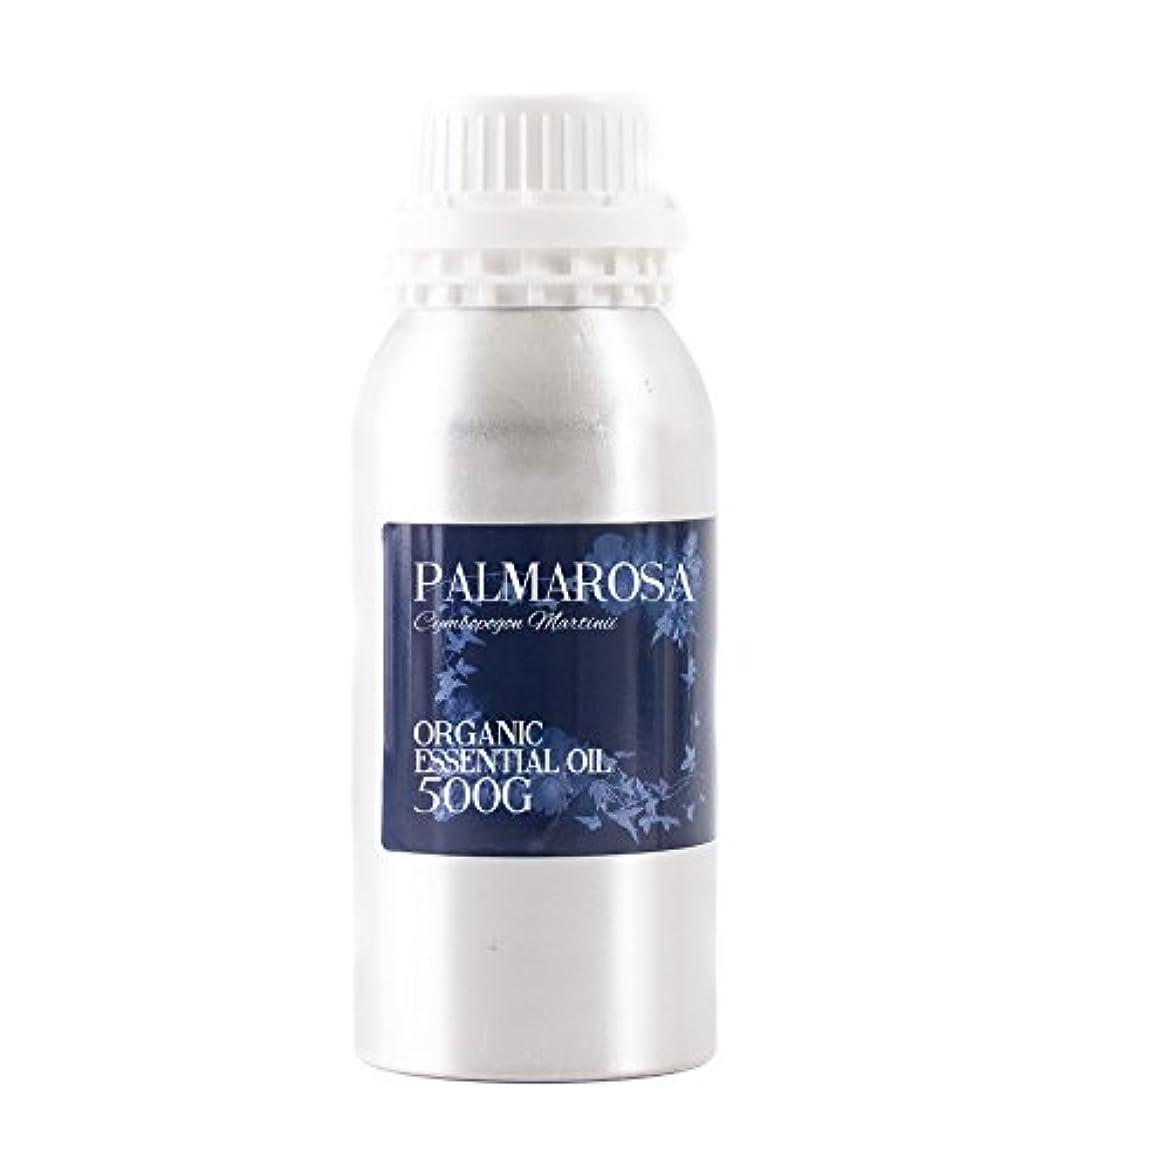 Mystic Moments | Palmarosa Organic Essential Oil - 500g - 100% Pure